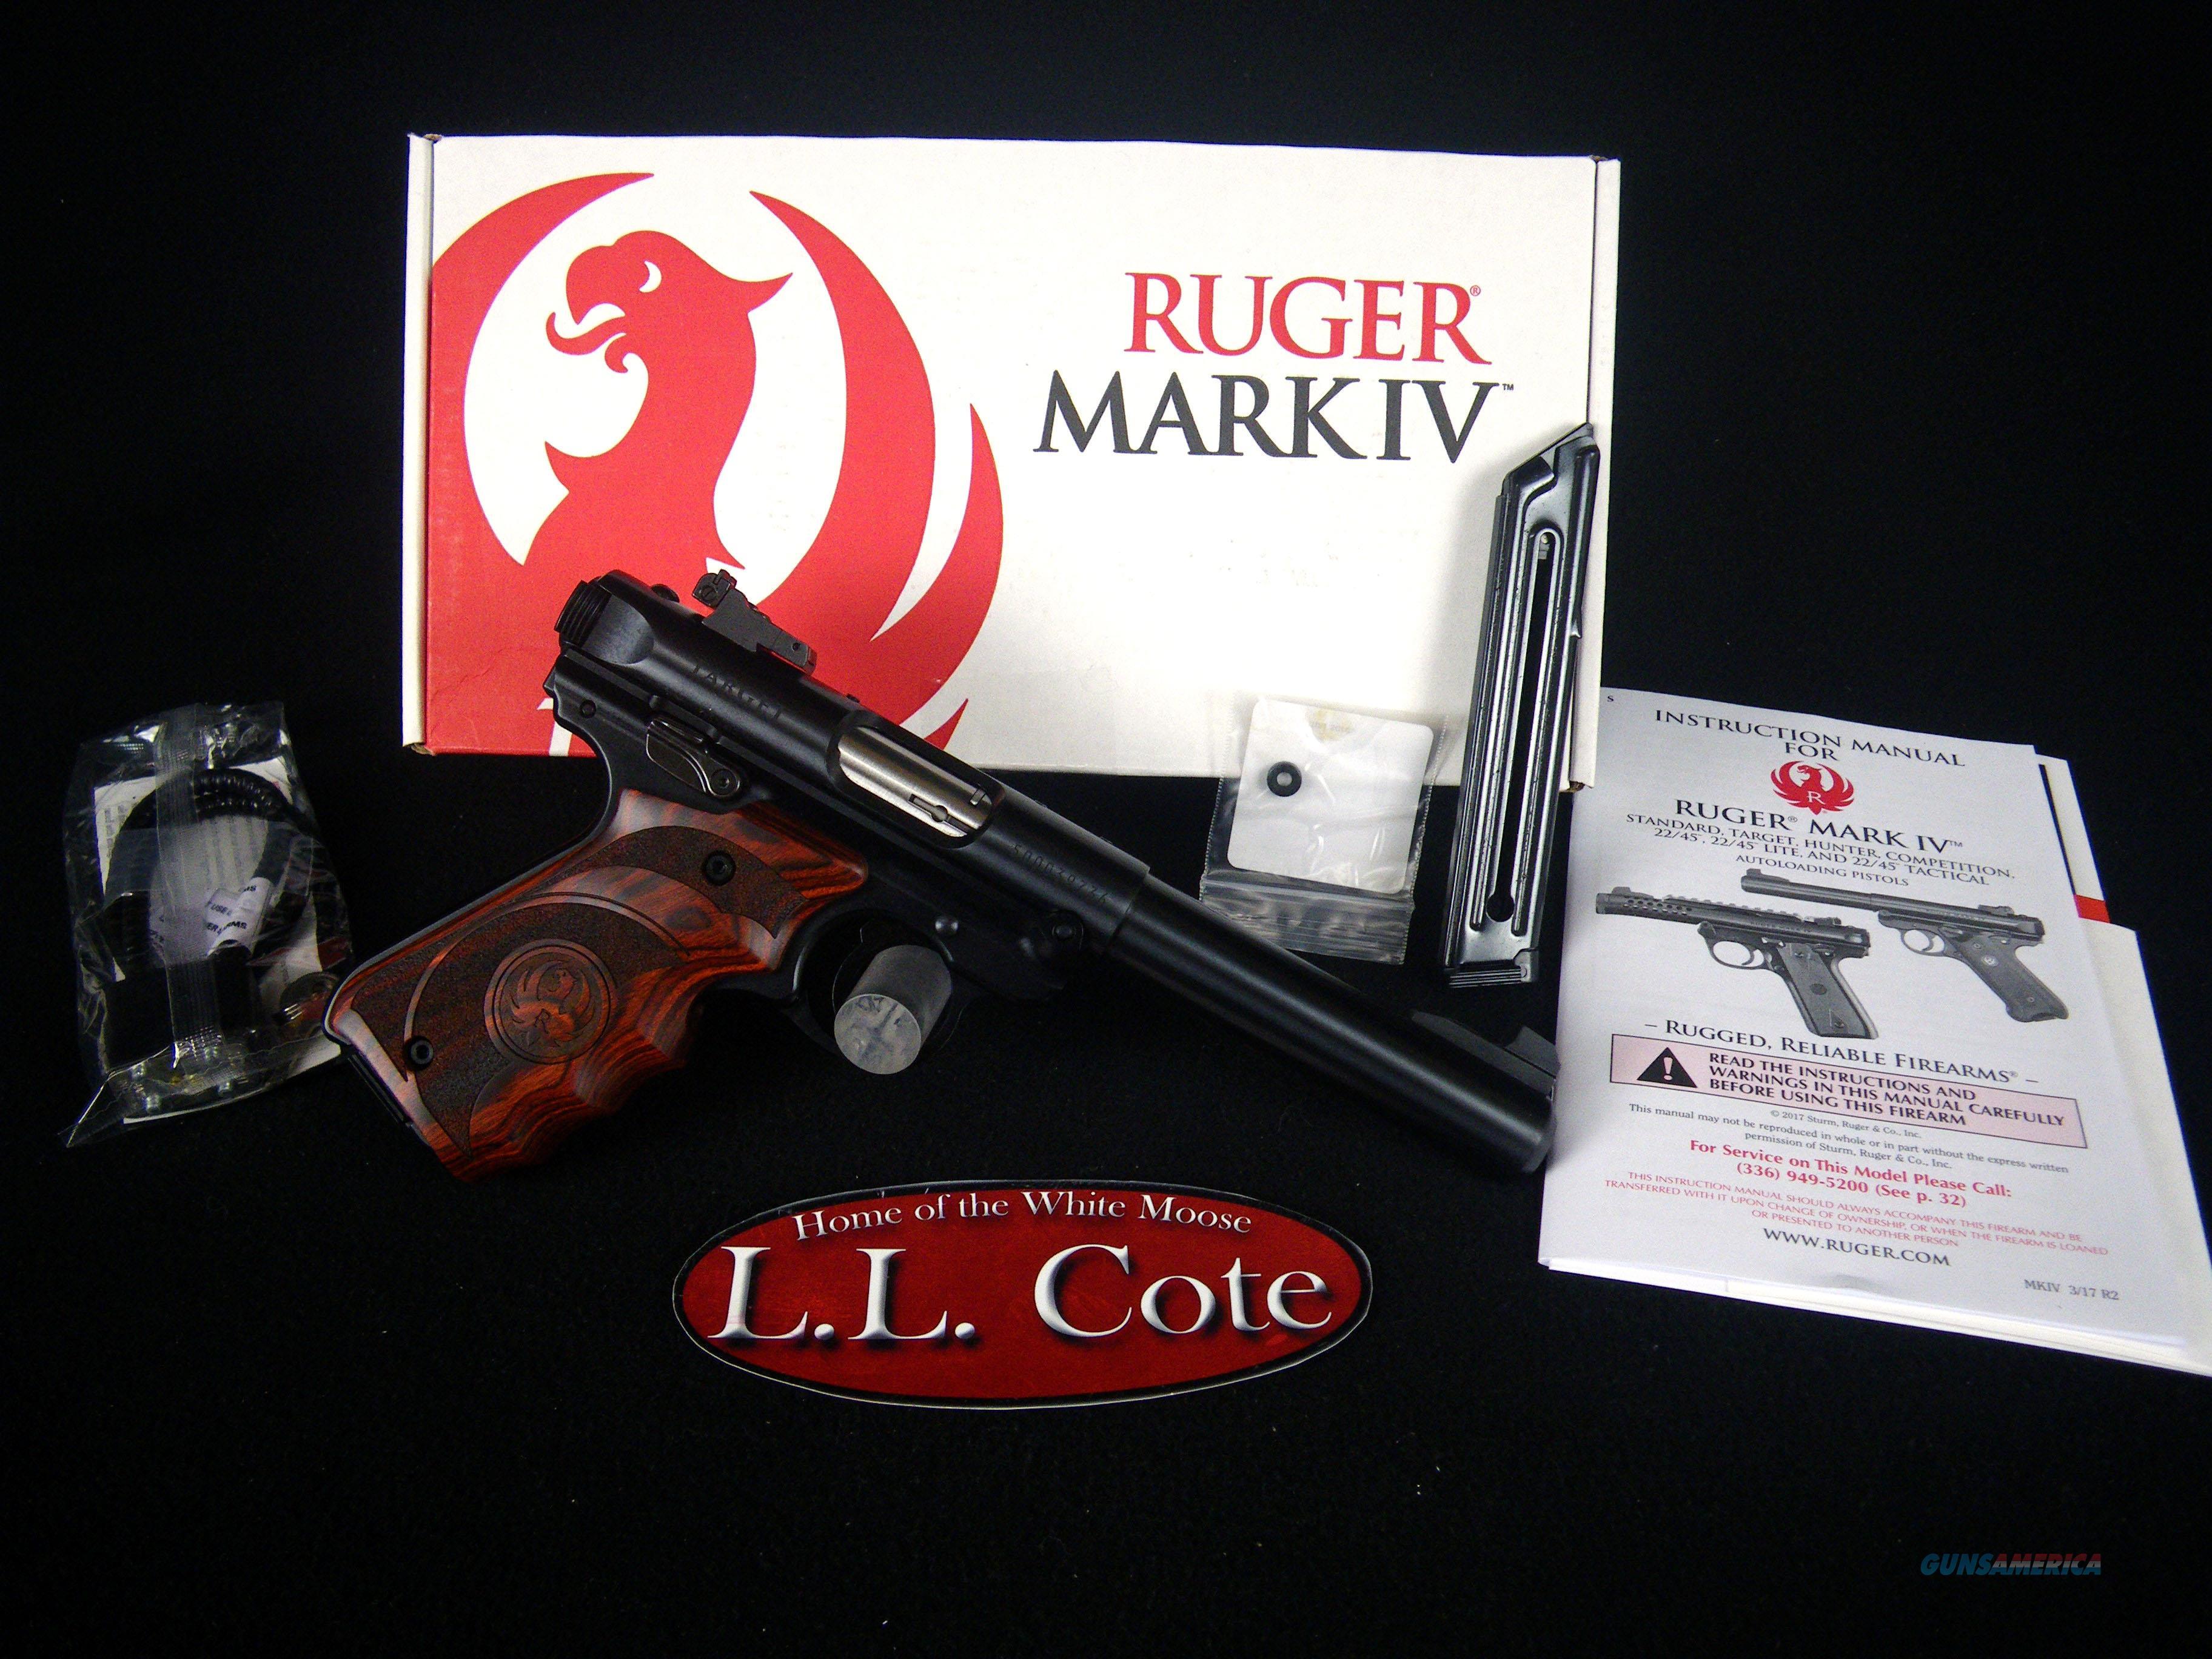 "Ruger Mark IV Target 22lr 5.5"" Bull Brl NEW 40159  Guns > Pistols > Ruger Semi-Auto Pistols > Mark I/II/III/IV Family"